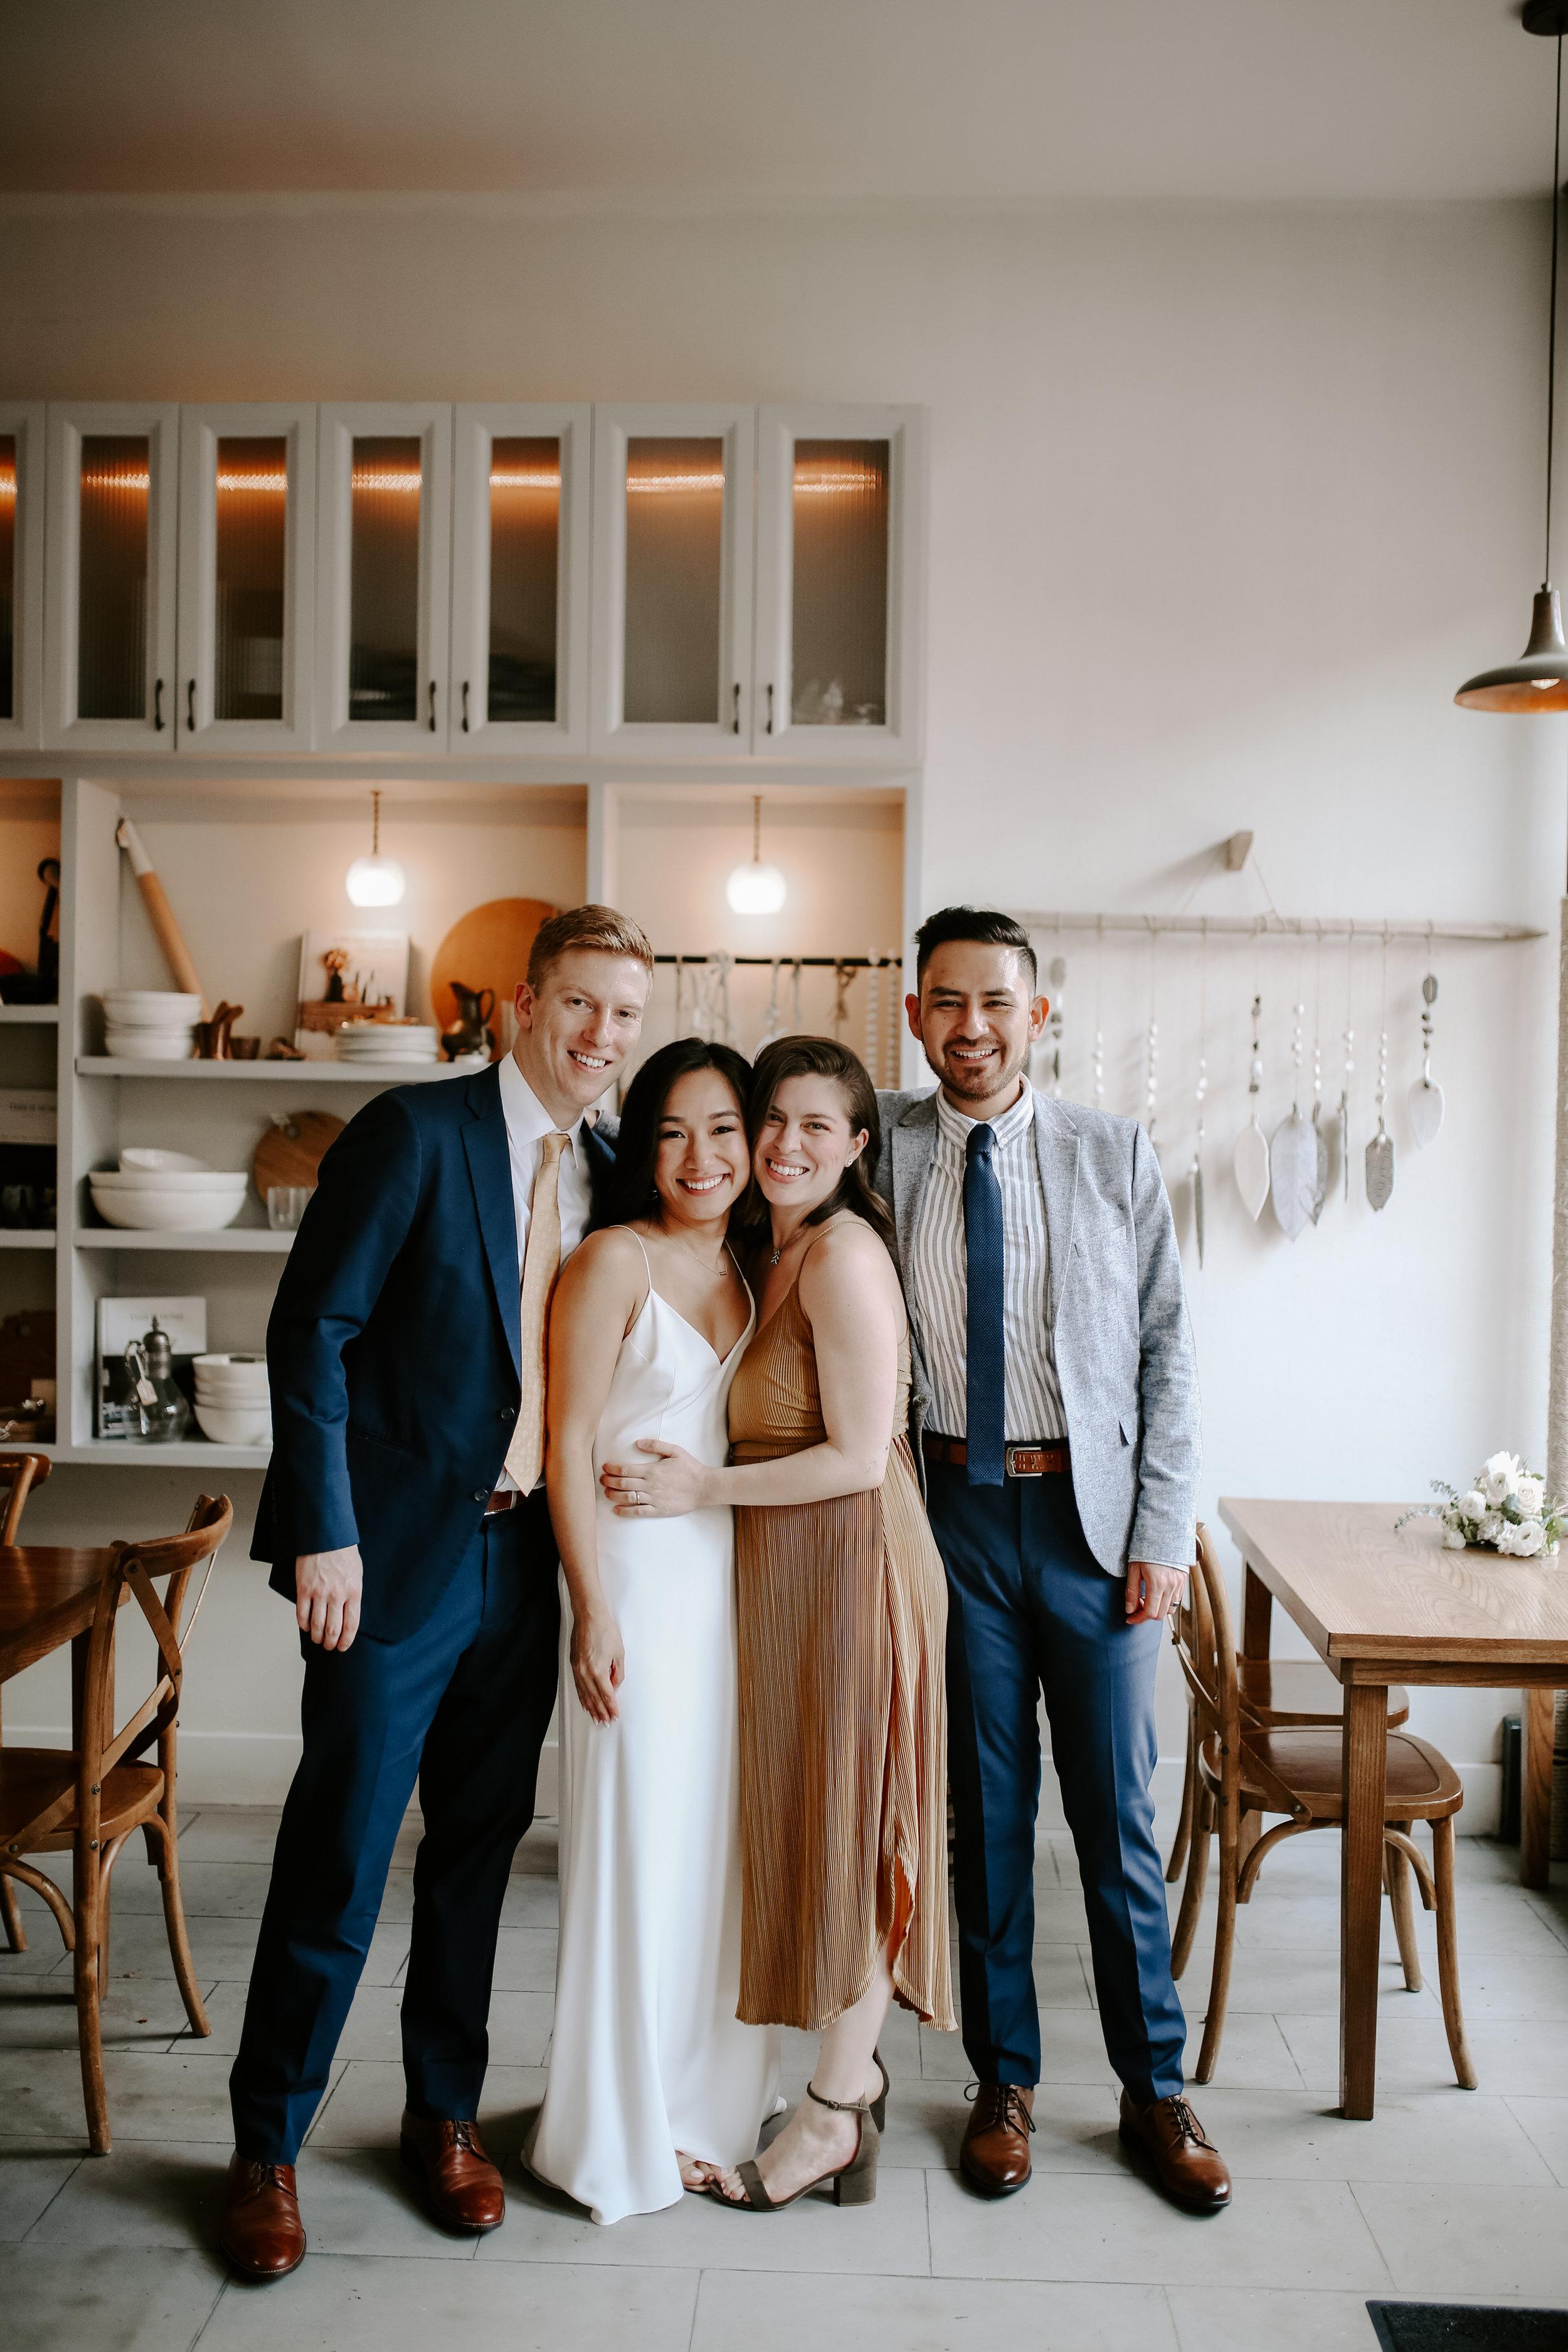 TheNichols_Married_2019-26.jpg